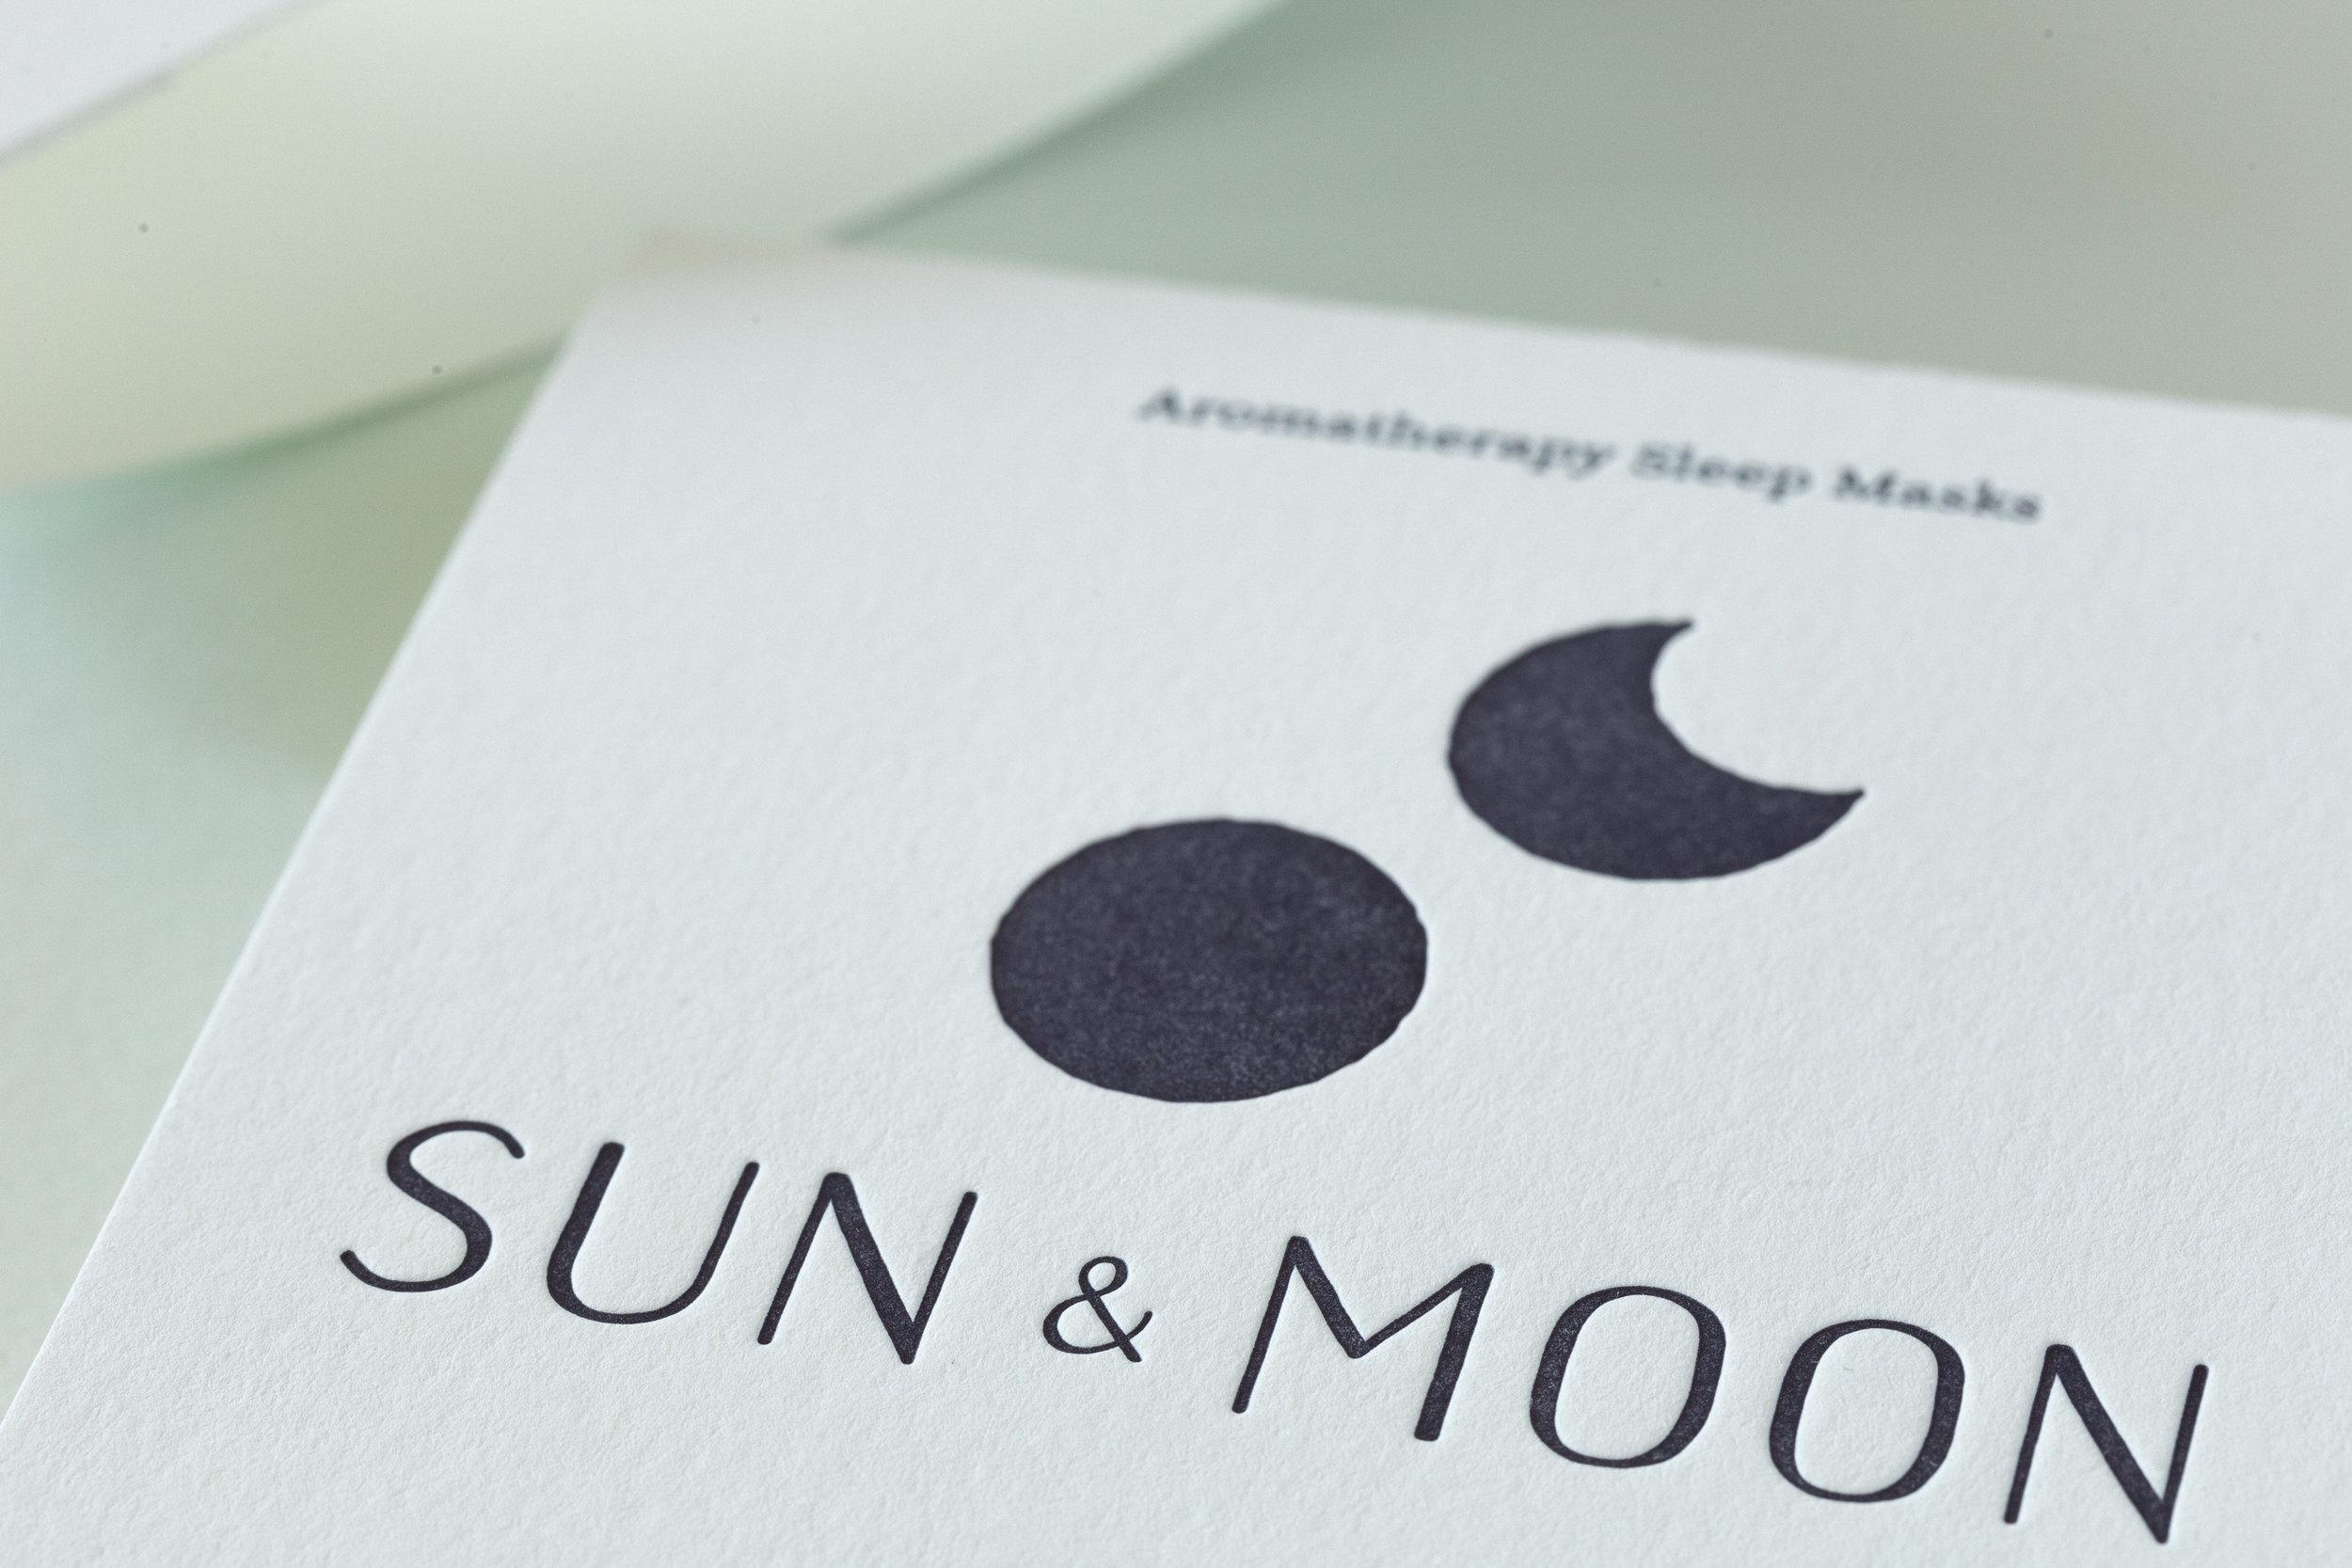 Sun & Moon Packaging